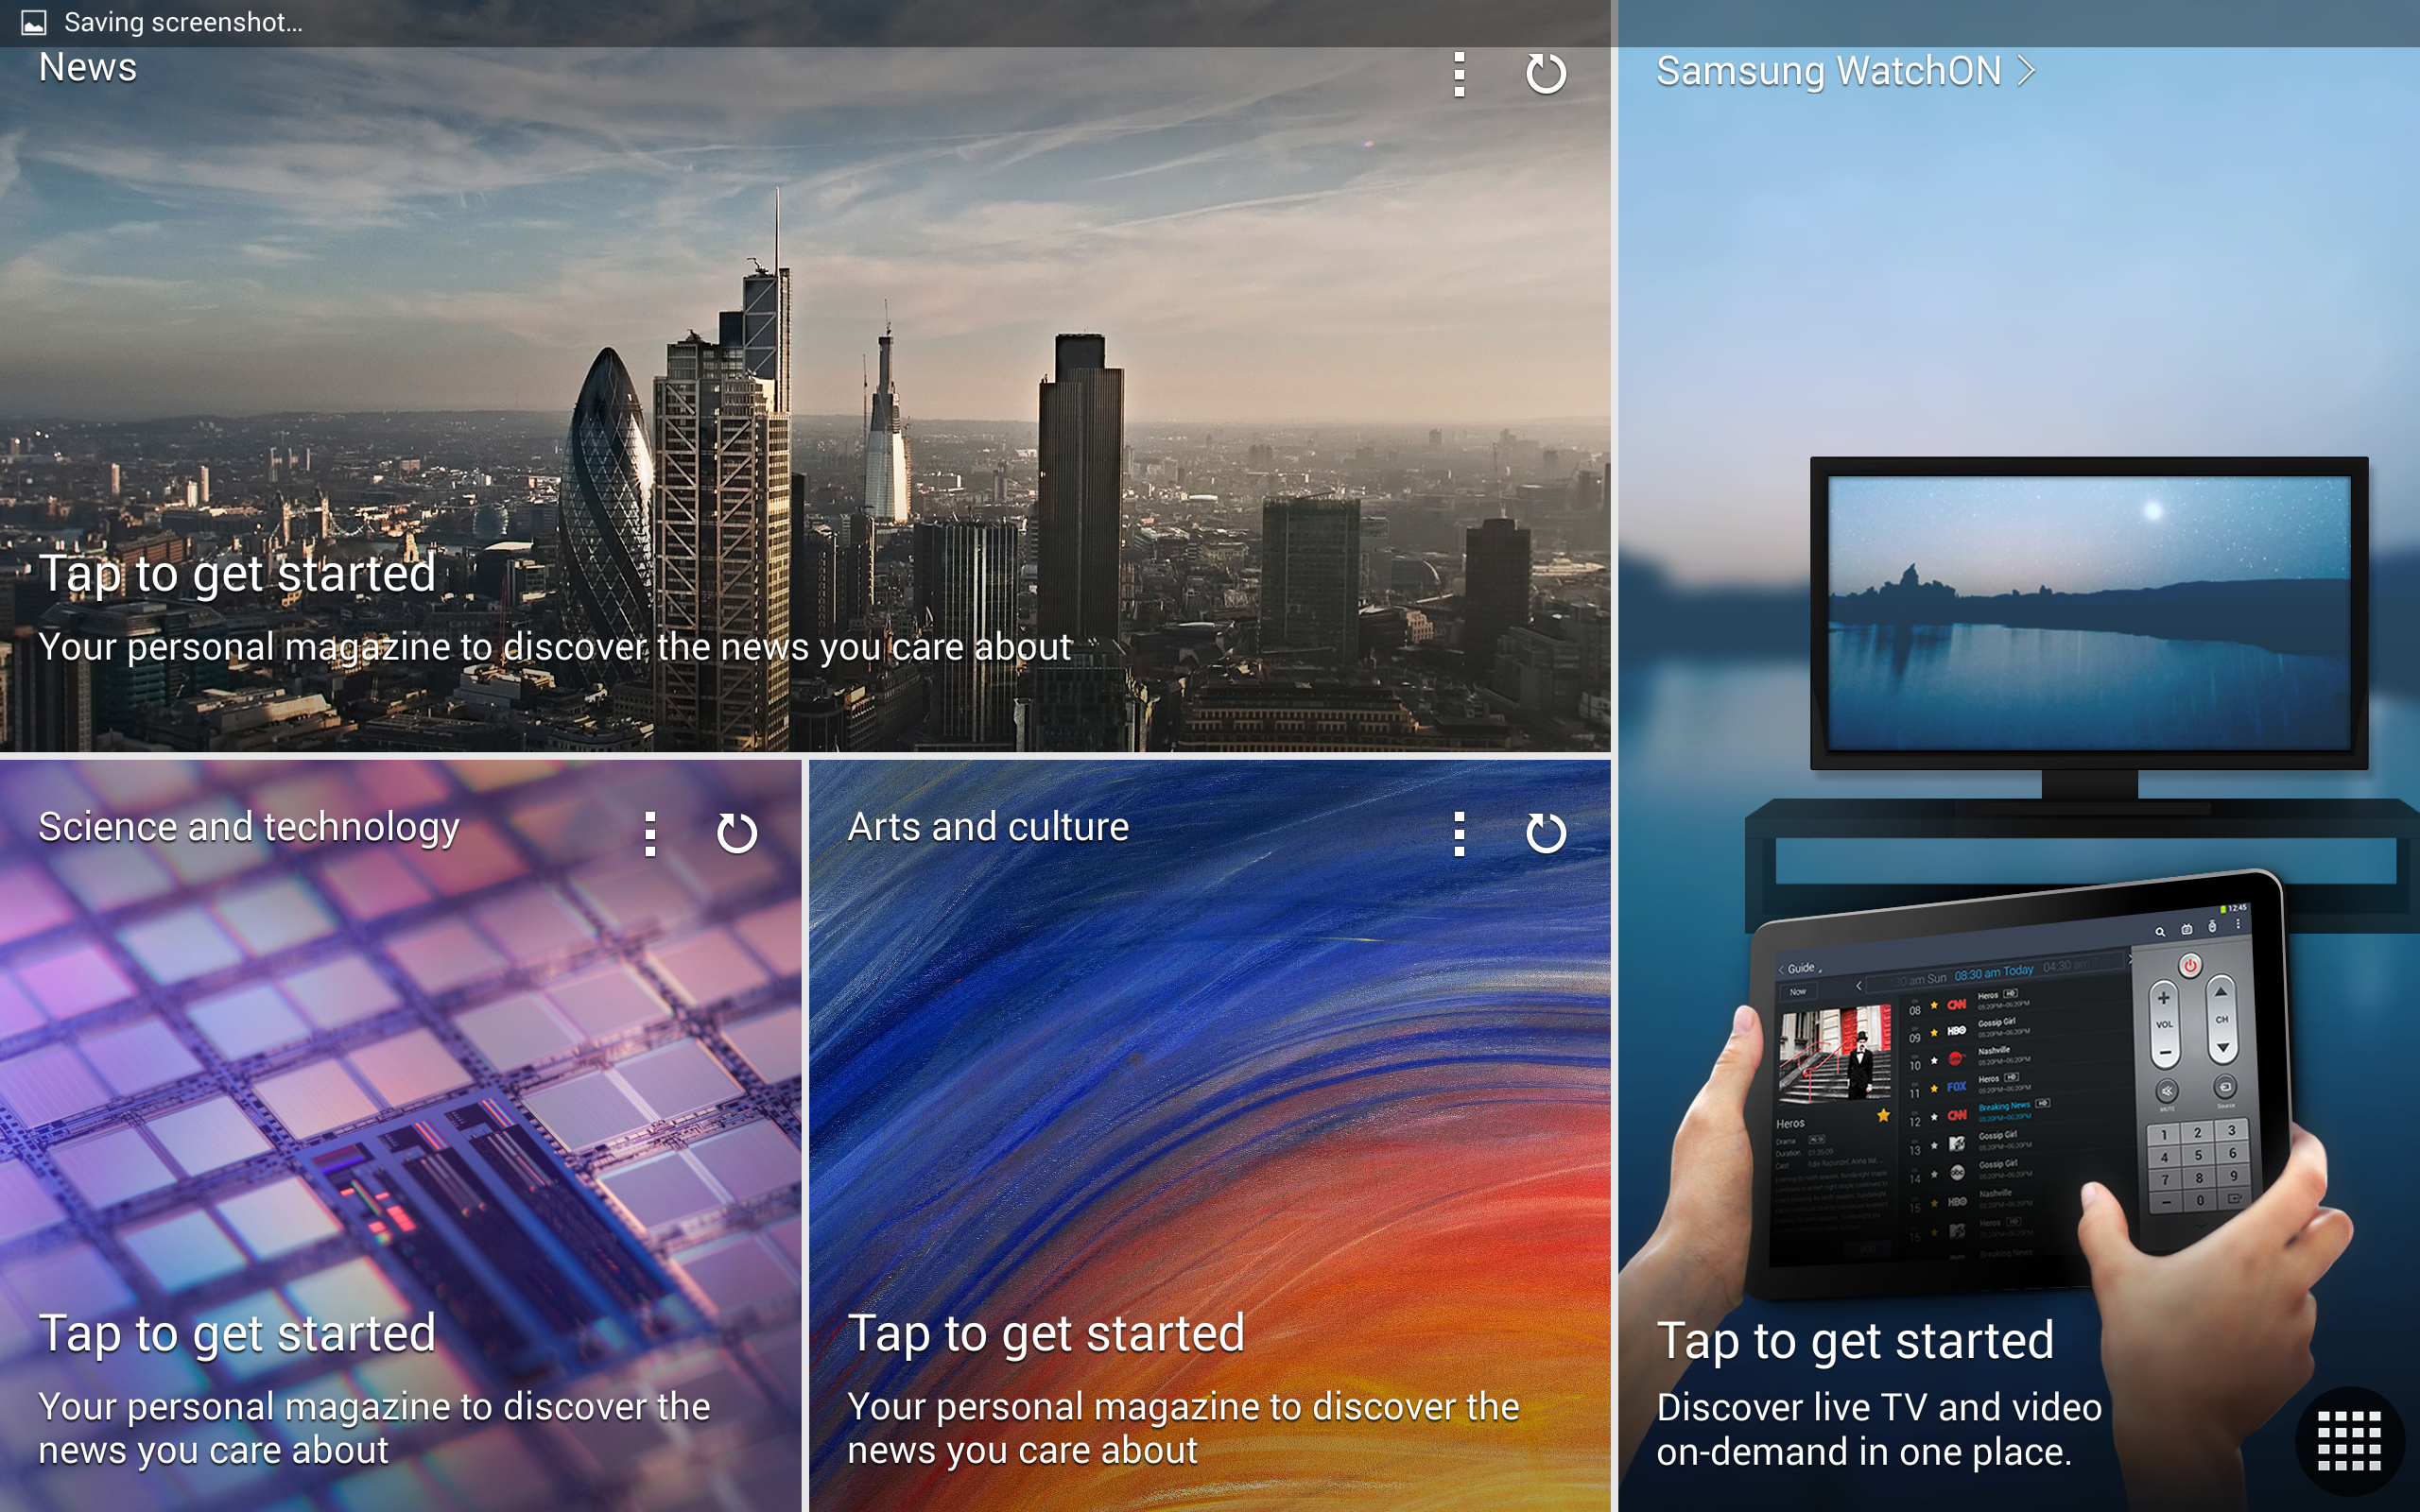 A screenshot of the Samsung Galaxy Note Pro's Flipboard screen.